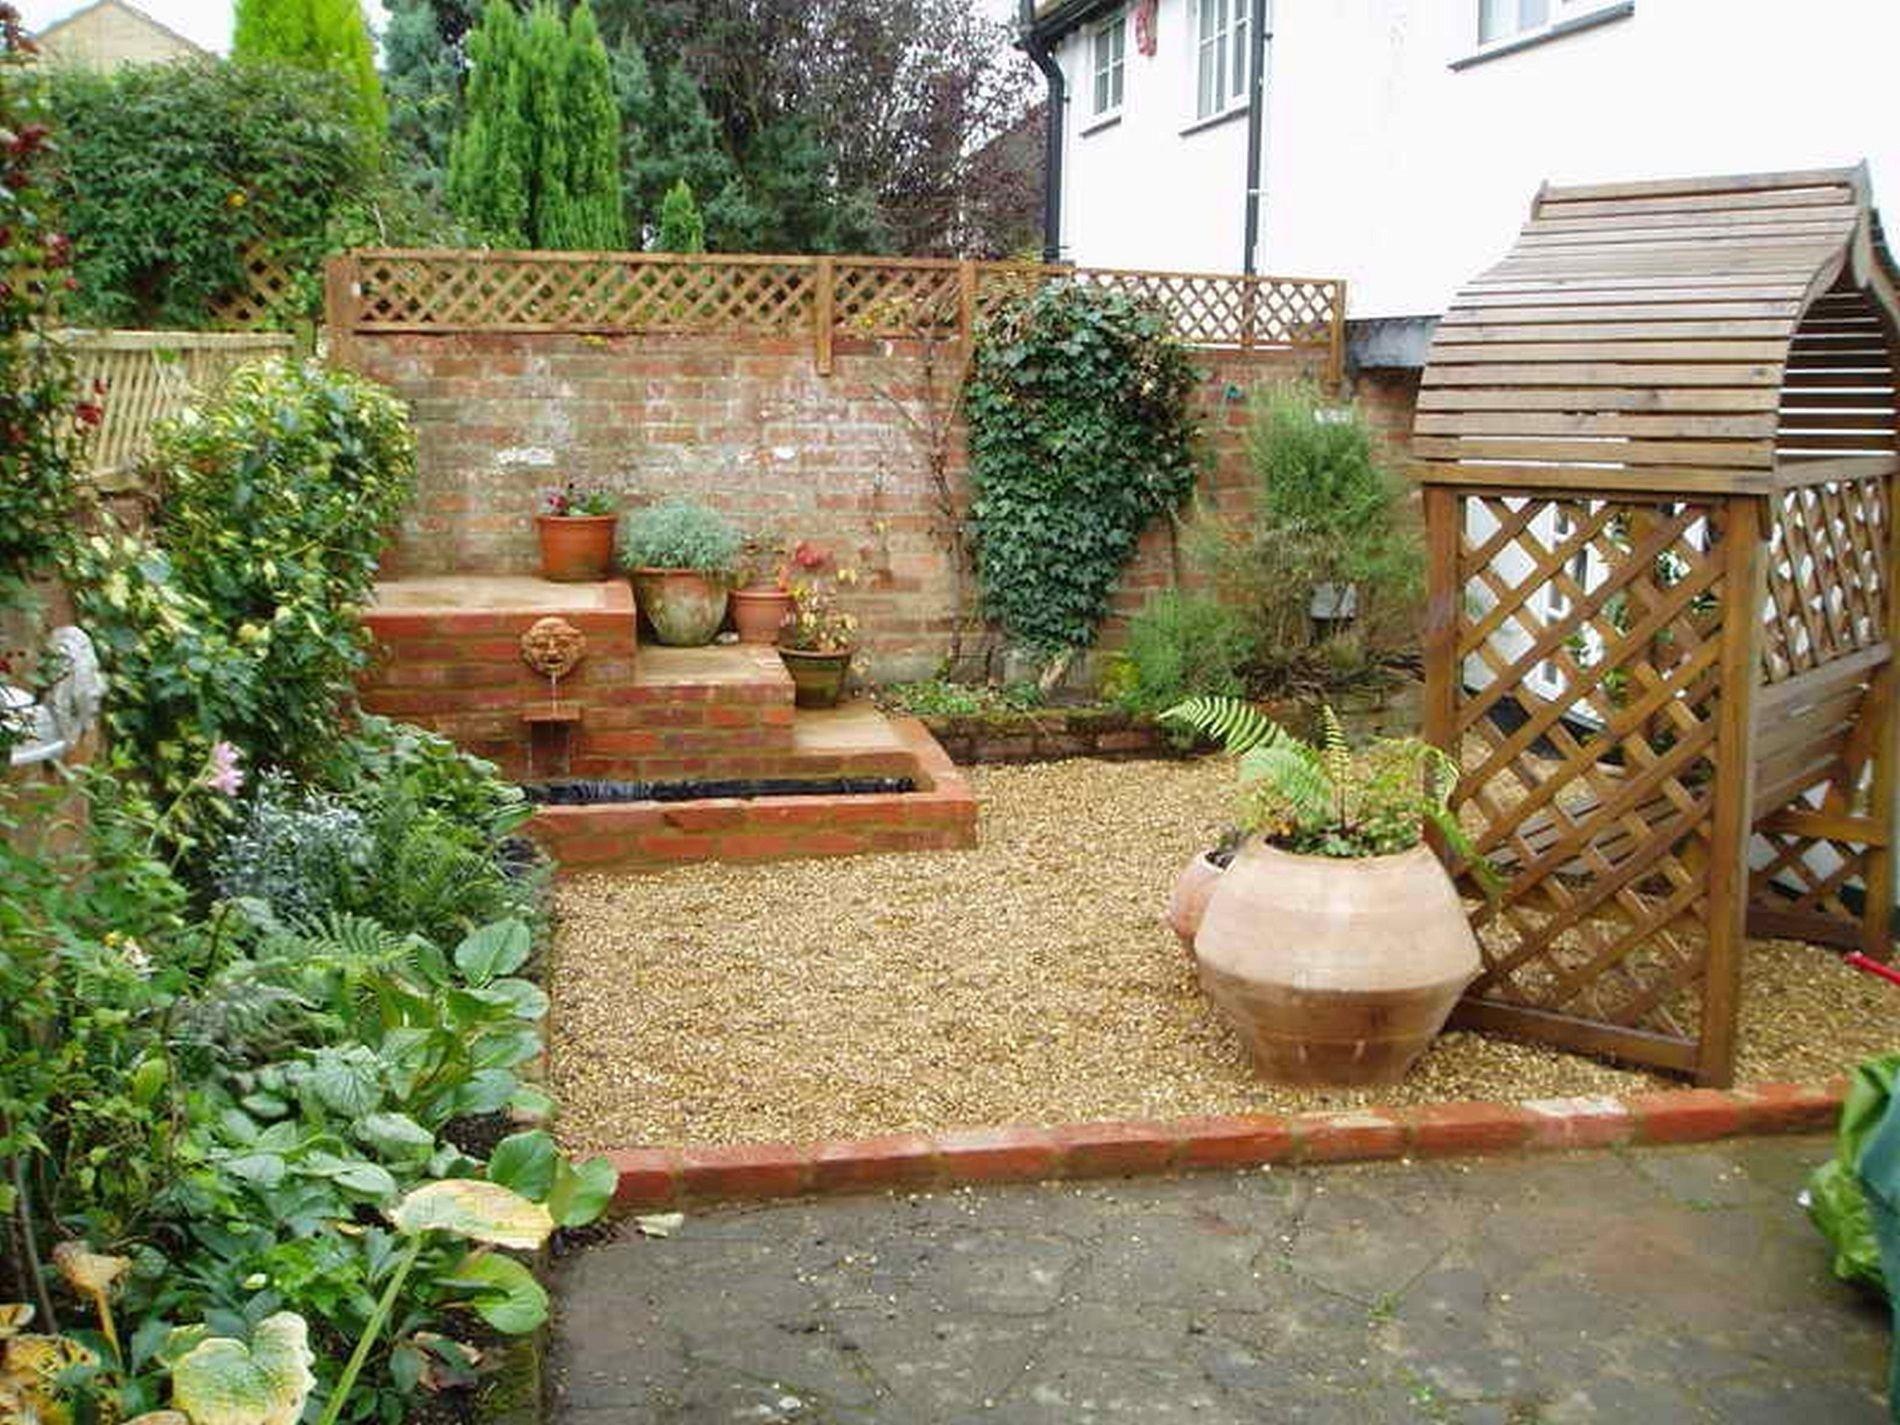 10 Cute Small Garden Ideas On A Budget small garden ideas on a budget lovely cheap easy backyard 2021